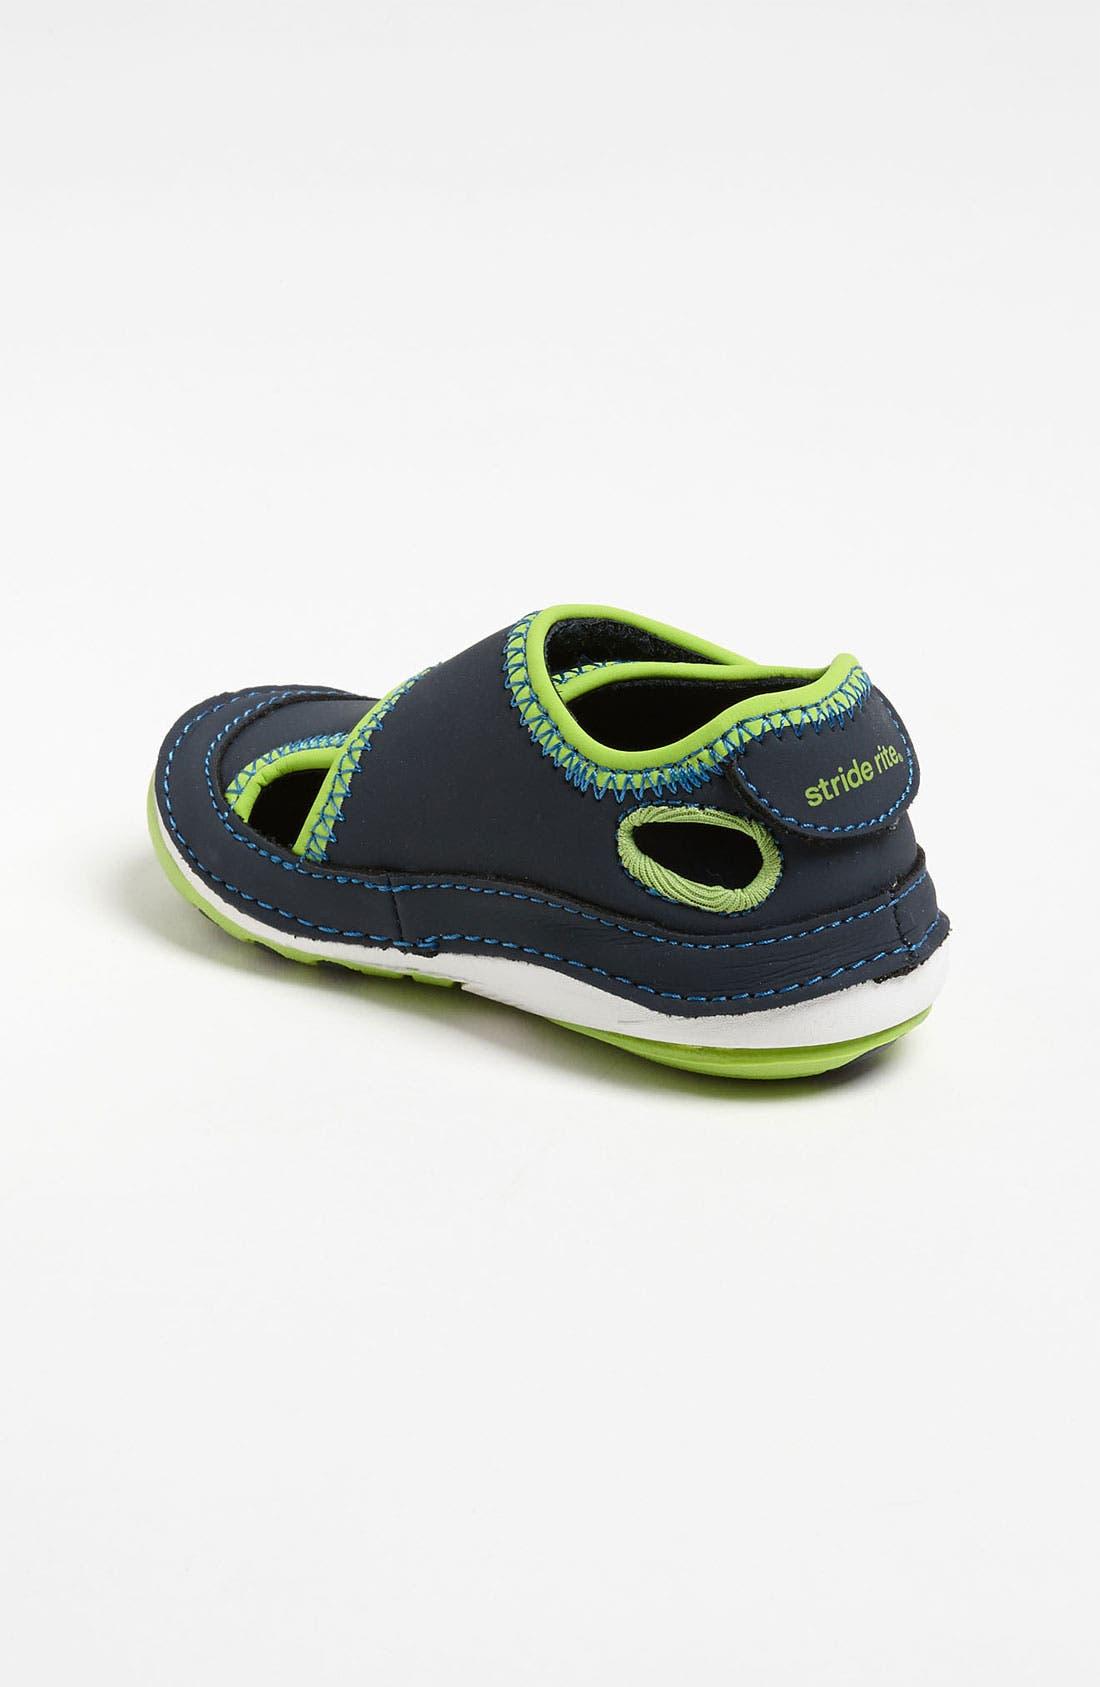 Alternate Image 2  - Stride Rite 'Crash' Sandal (Baby & Walker)